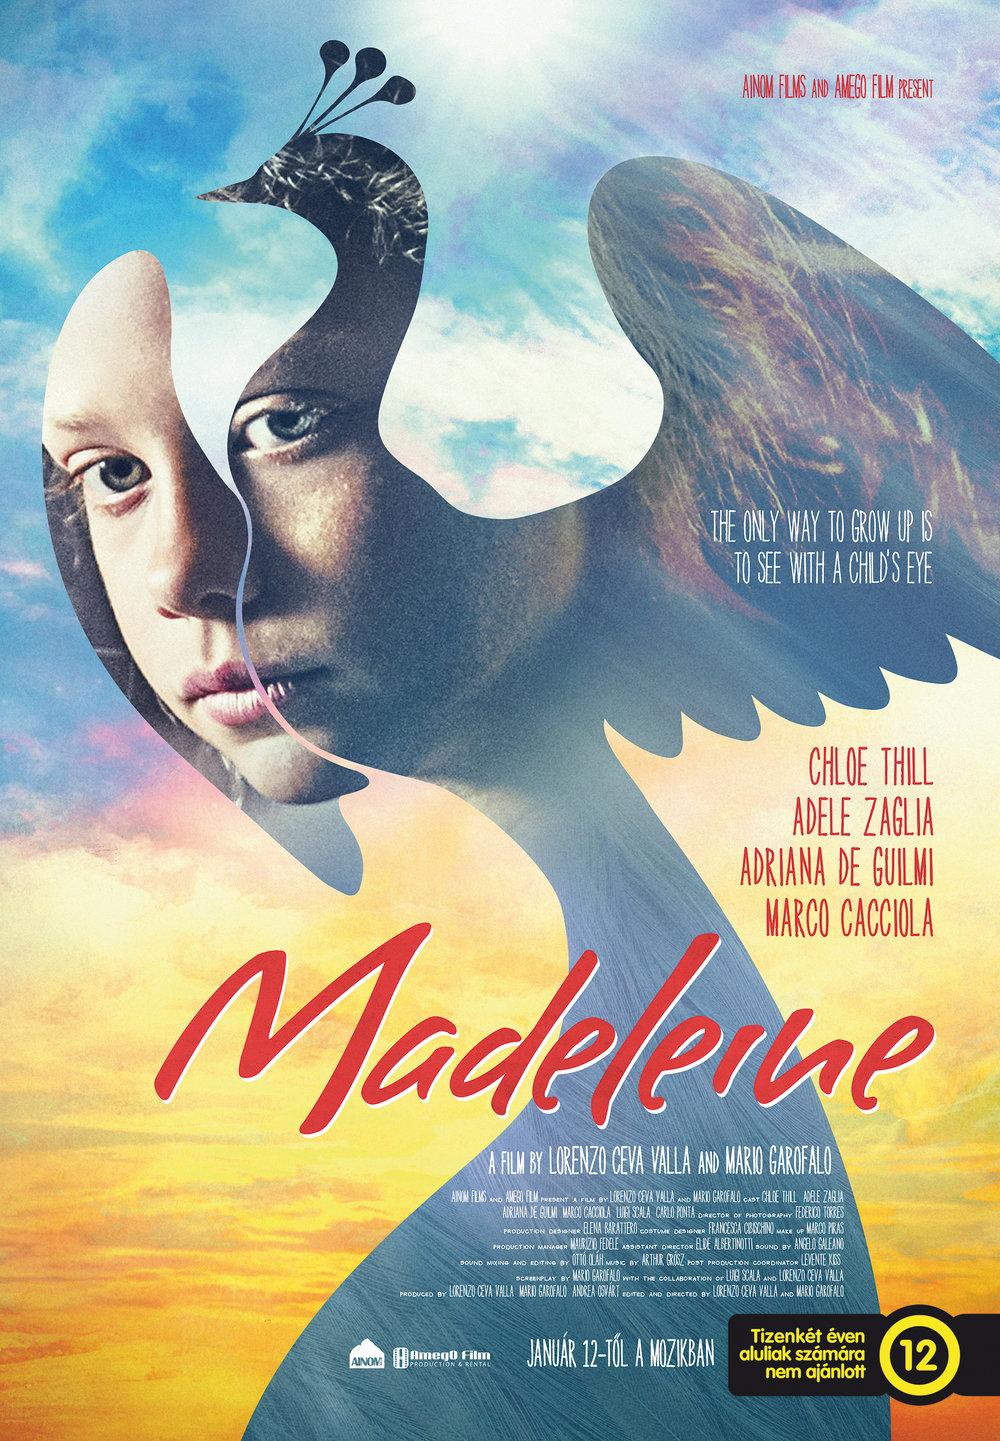 Madeleine B1 poszter korhataros januar 2017